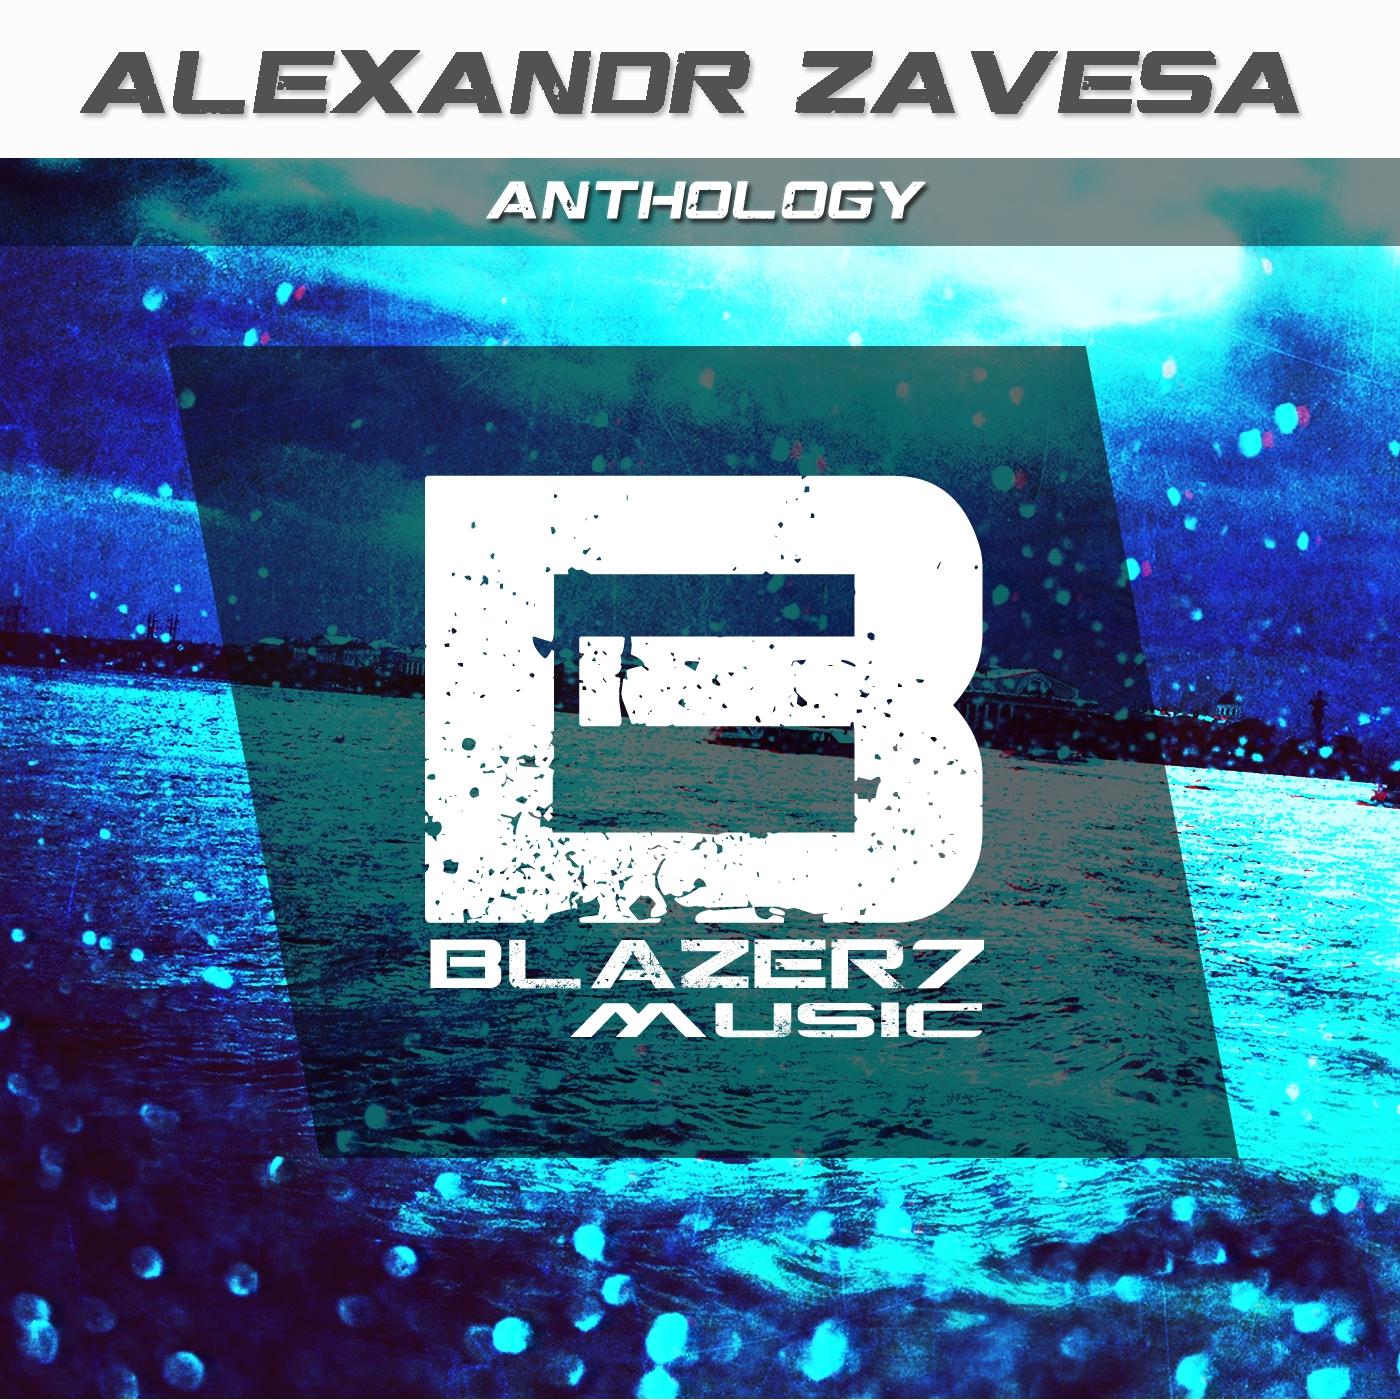 Alexandr Zavesa - Orison (Original Mix)